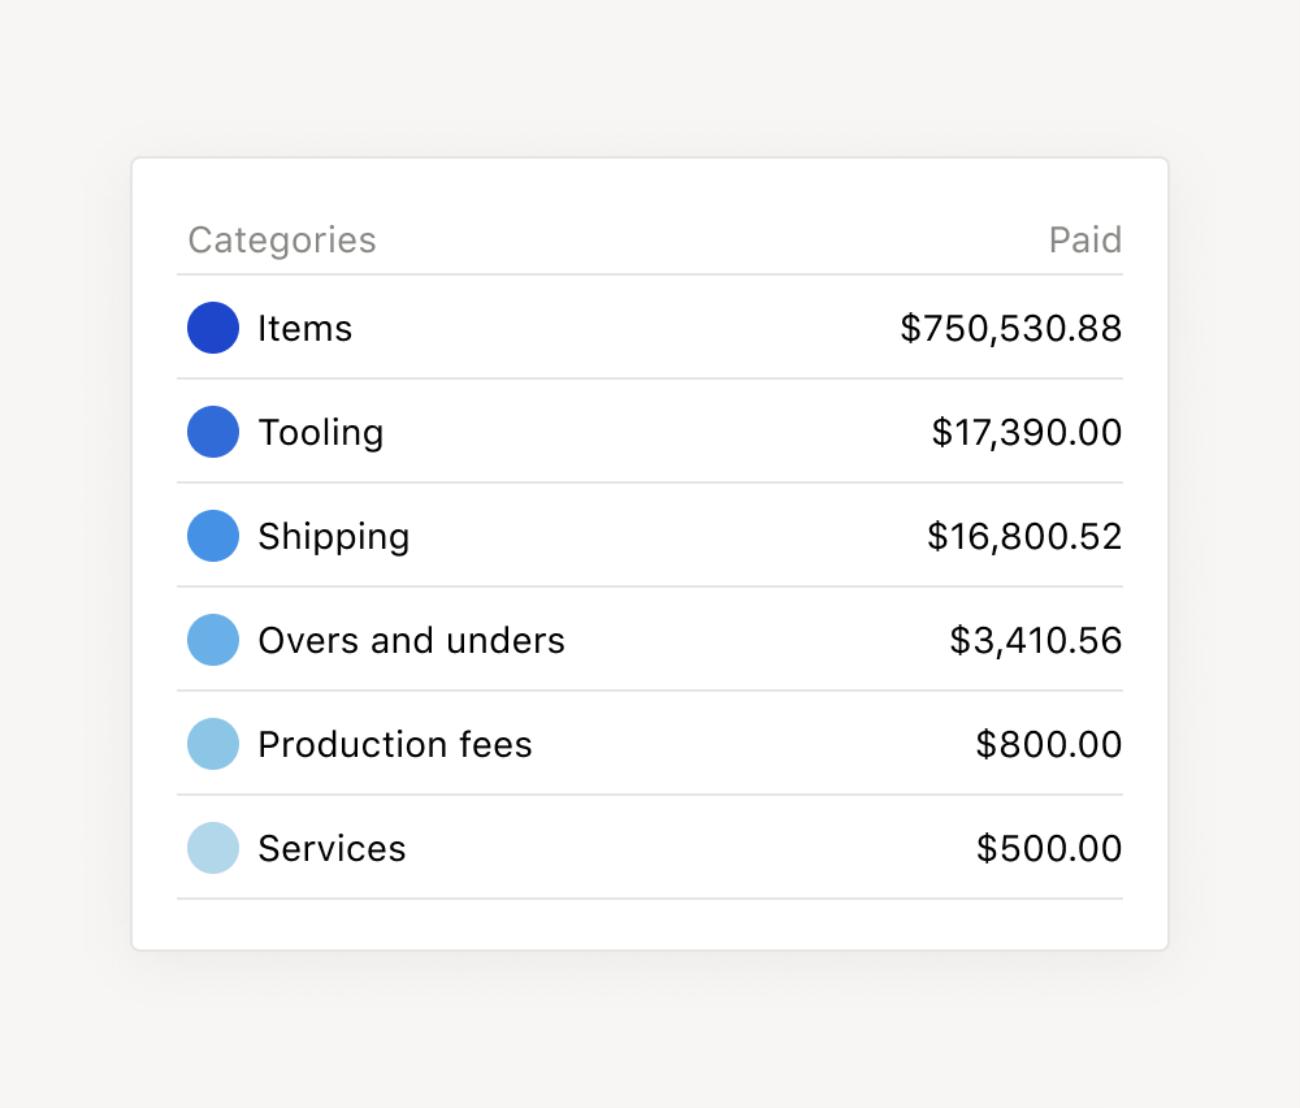 Billing categories